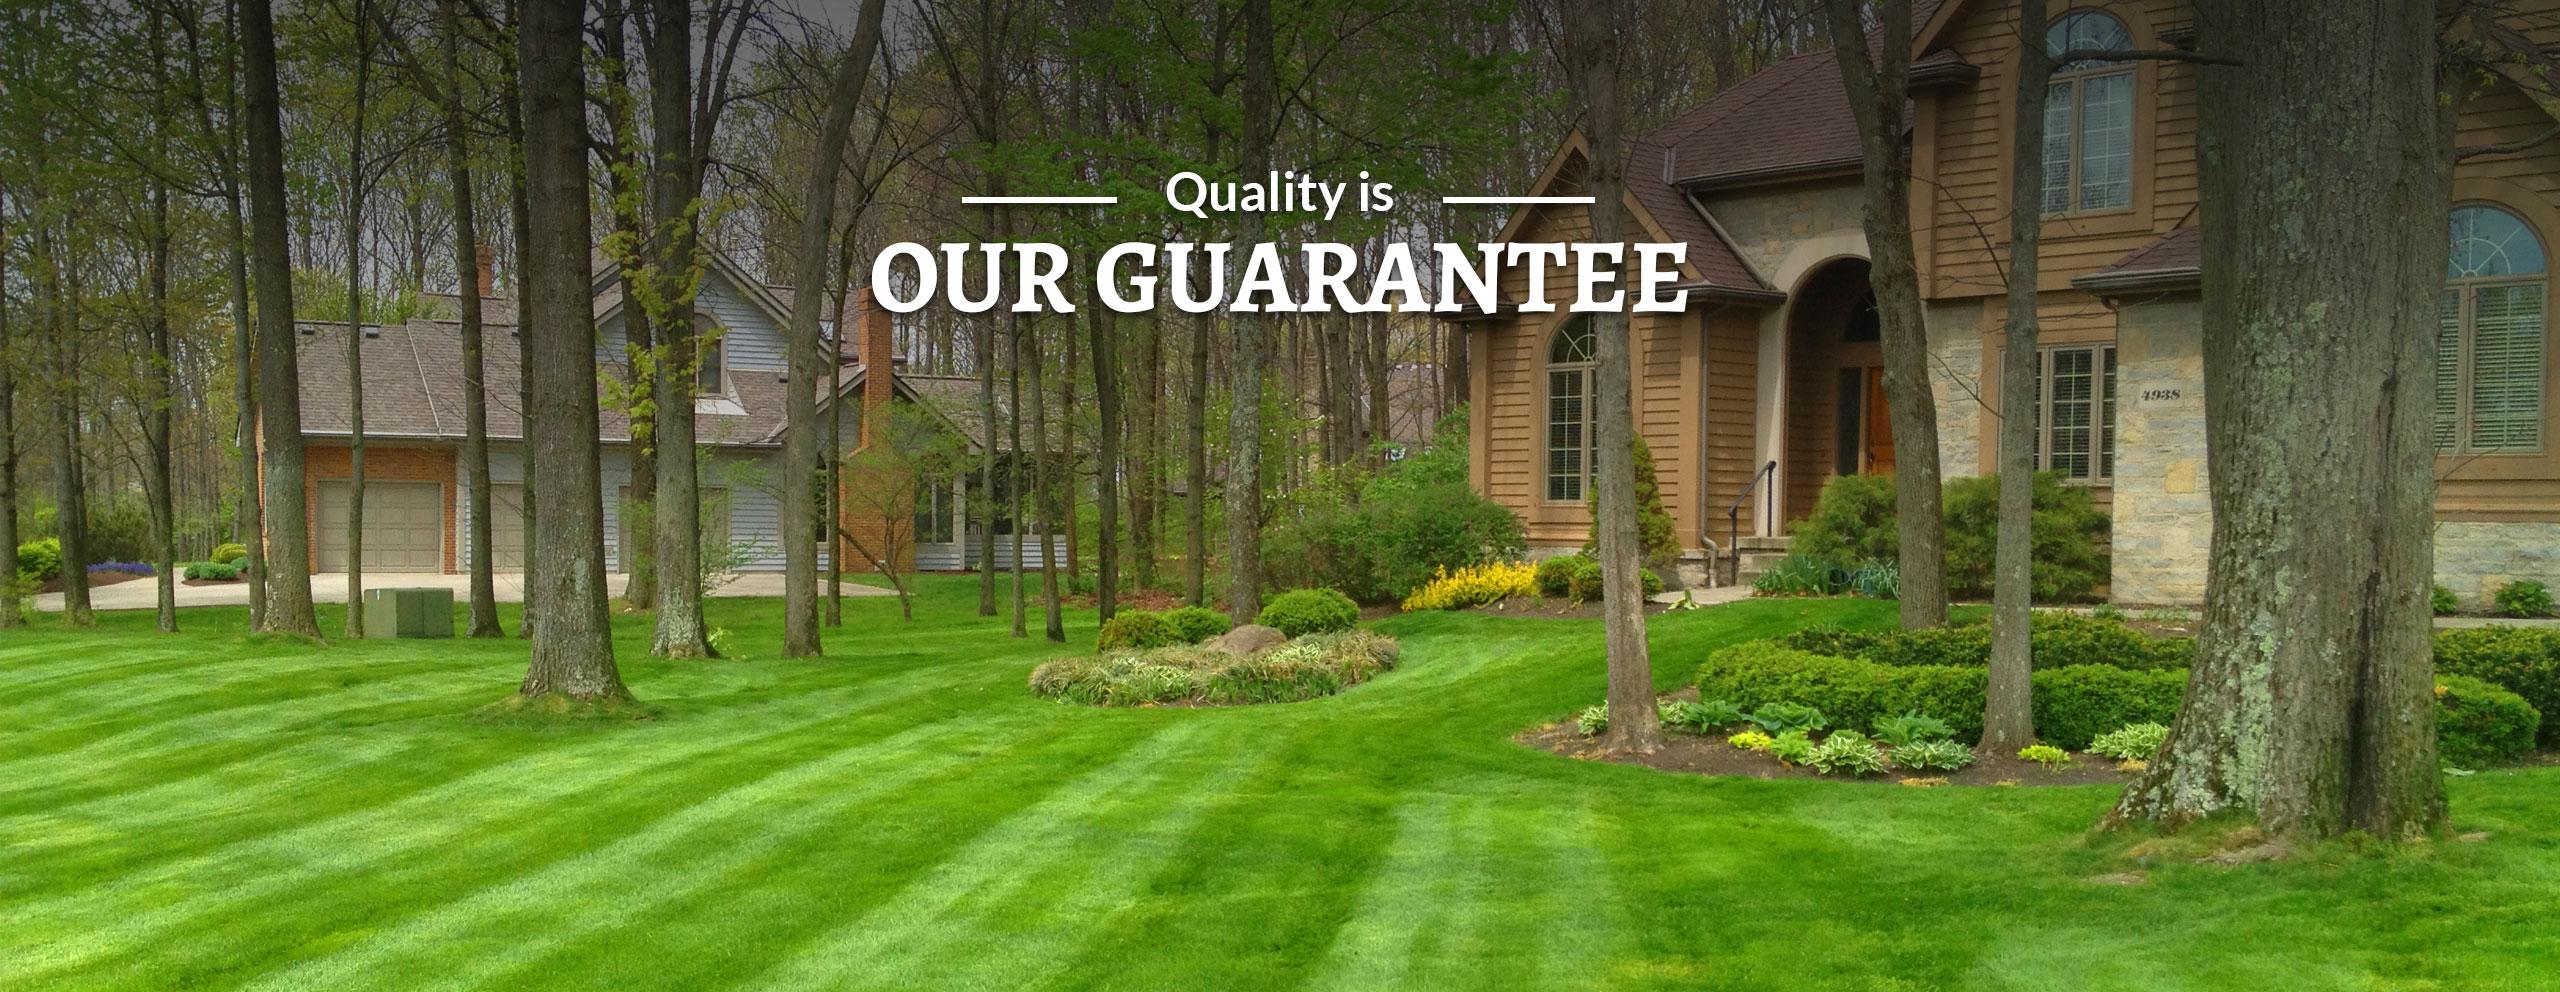 Lawn Care Landscaping Company Lawn Fertilization